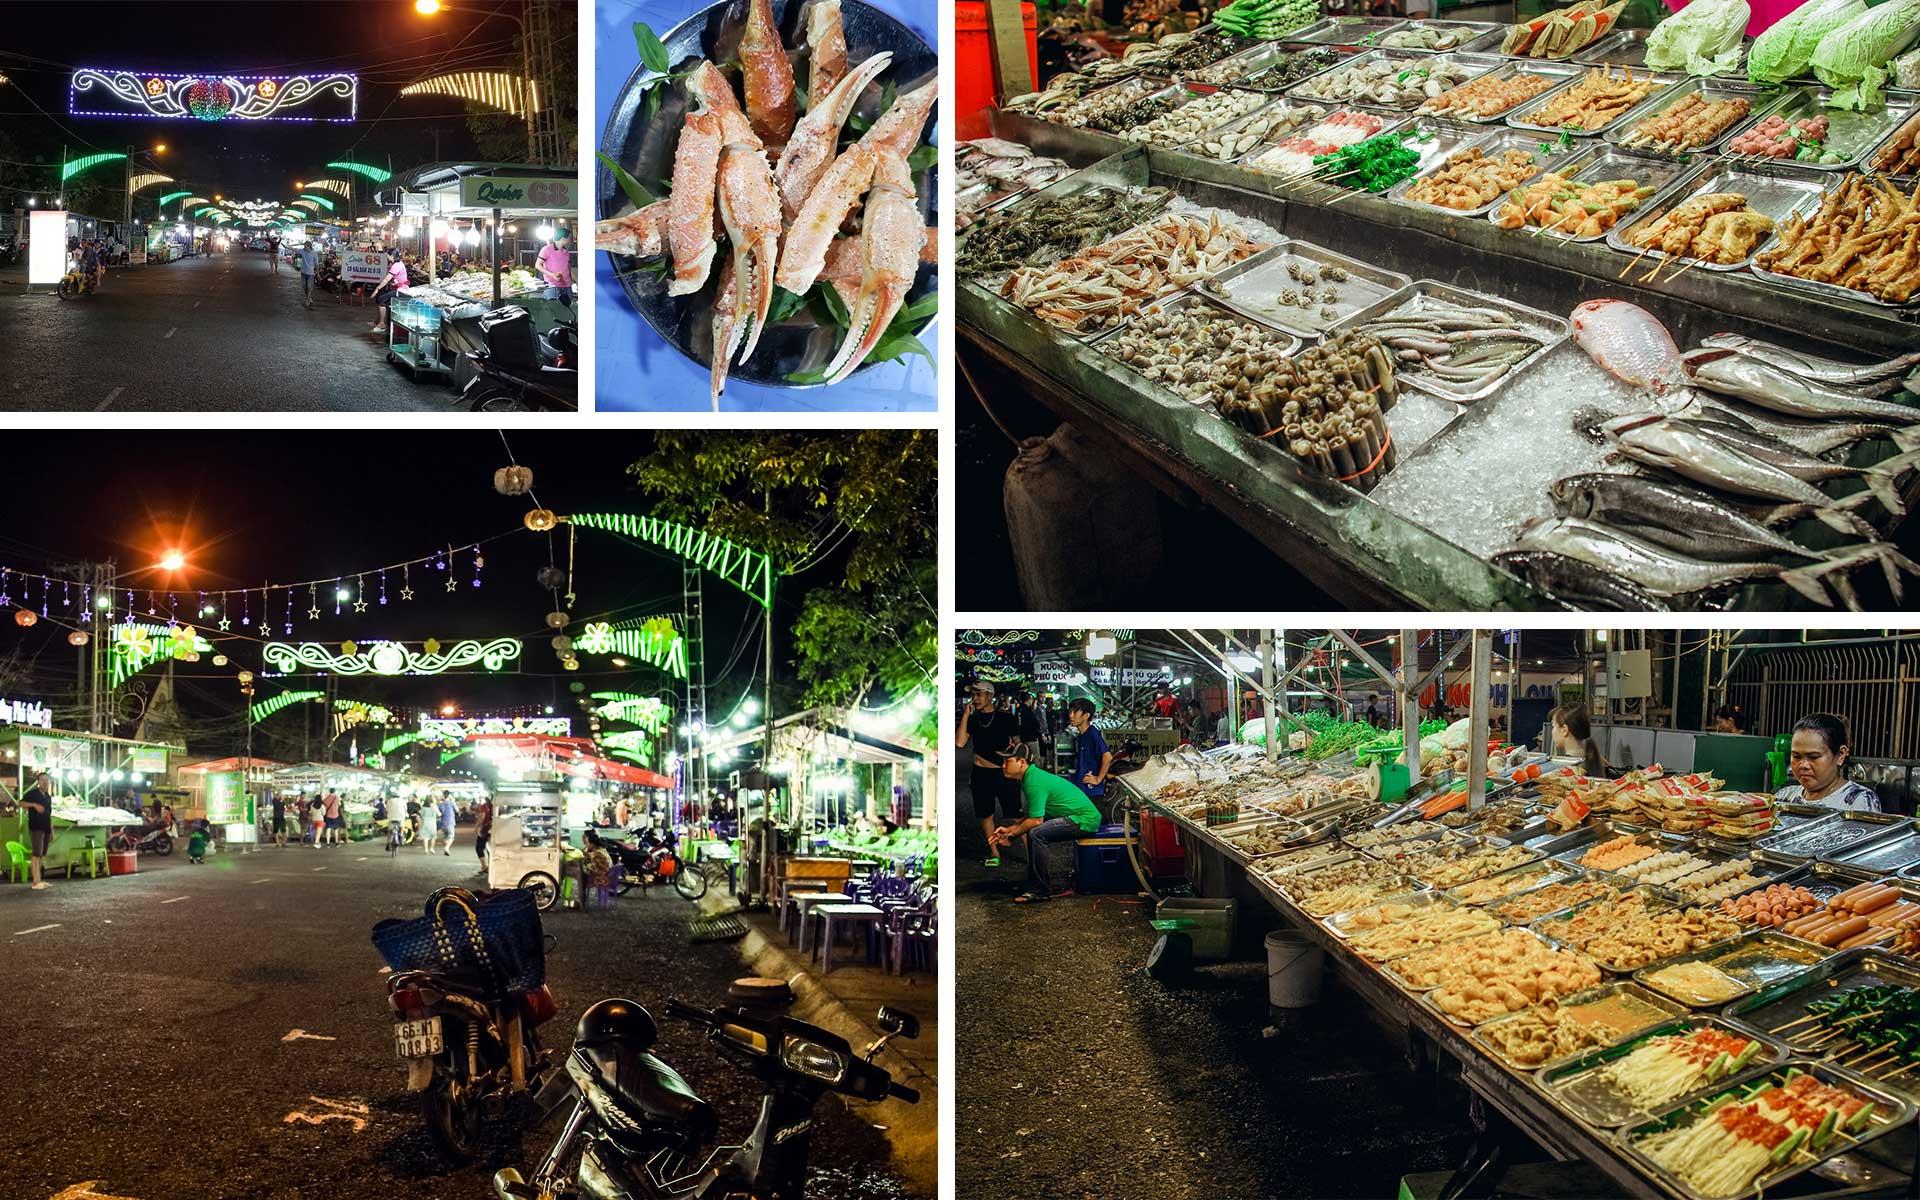 Tran Phu Night Market